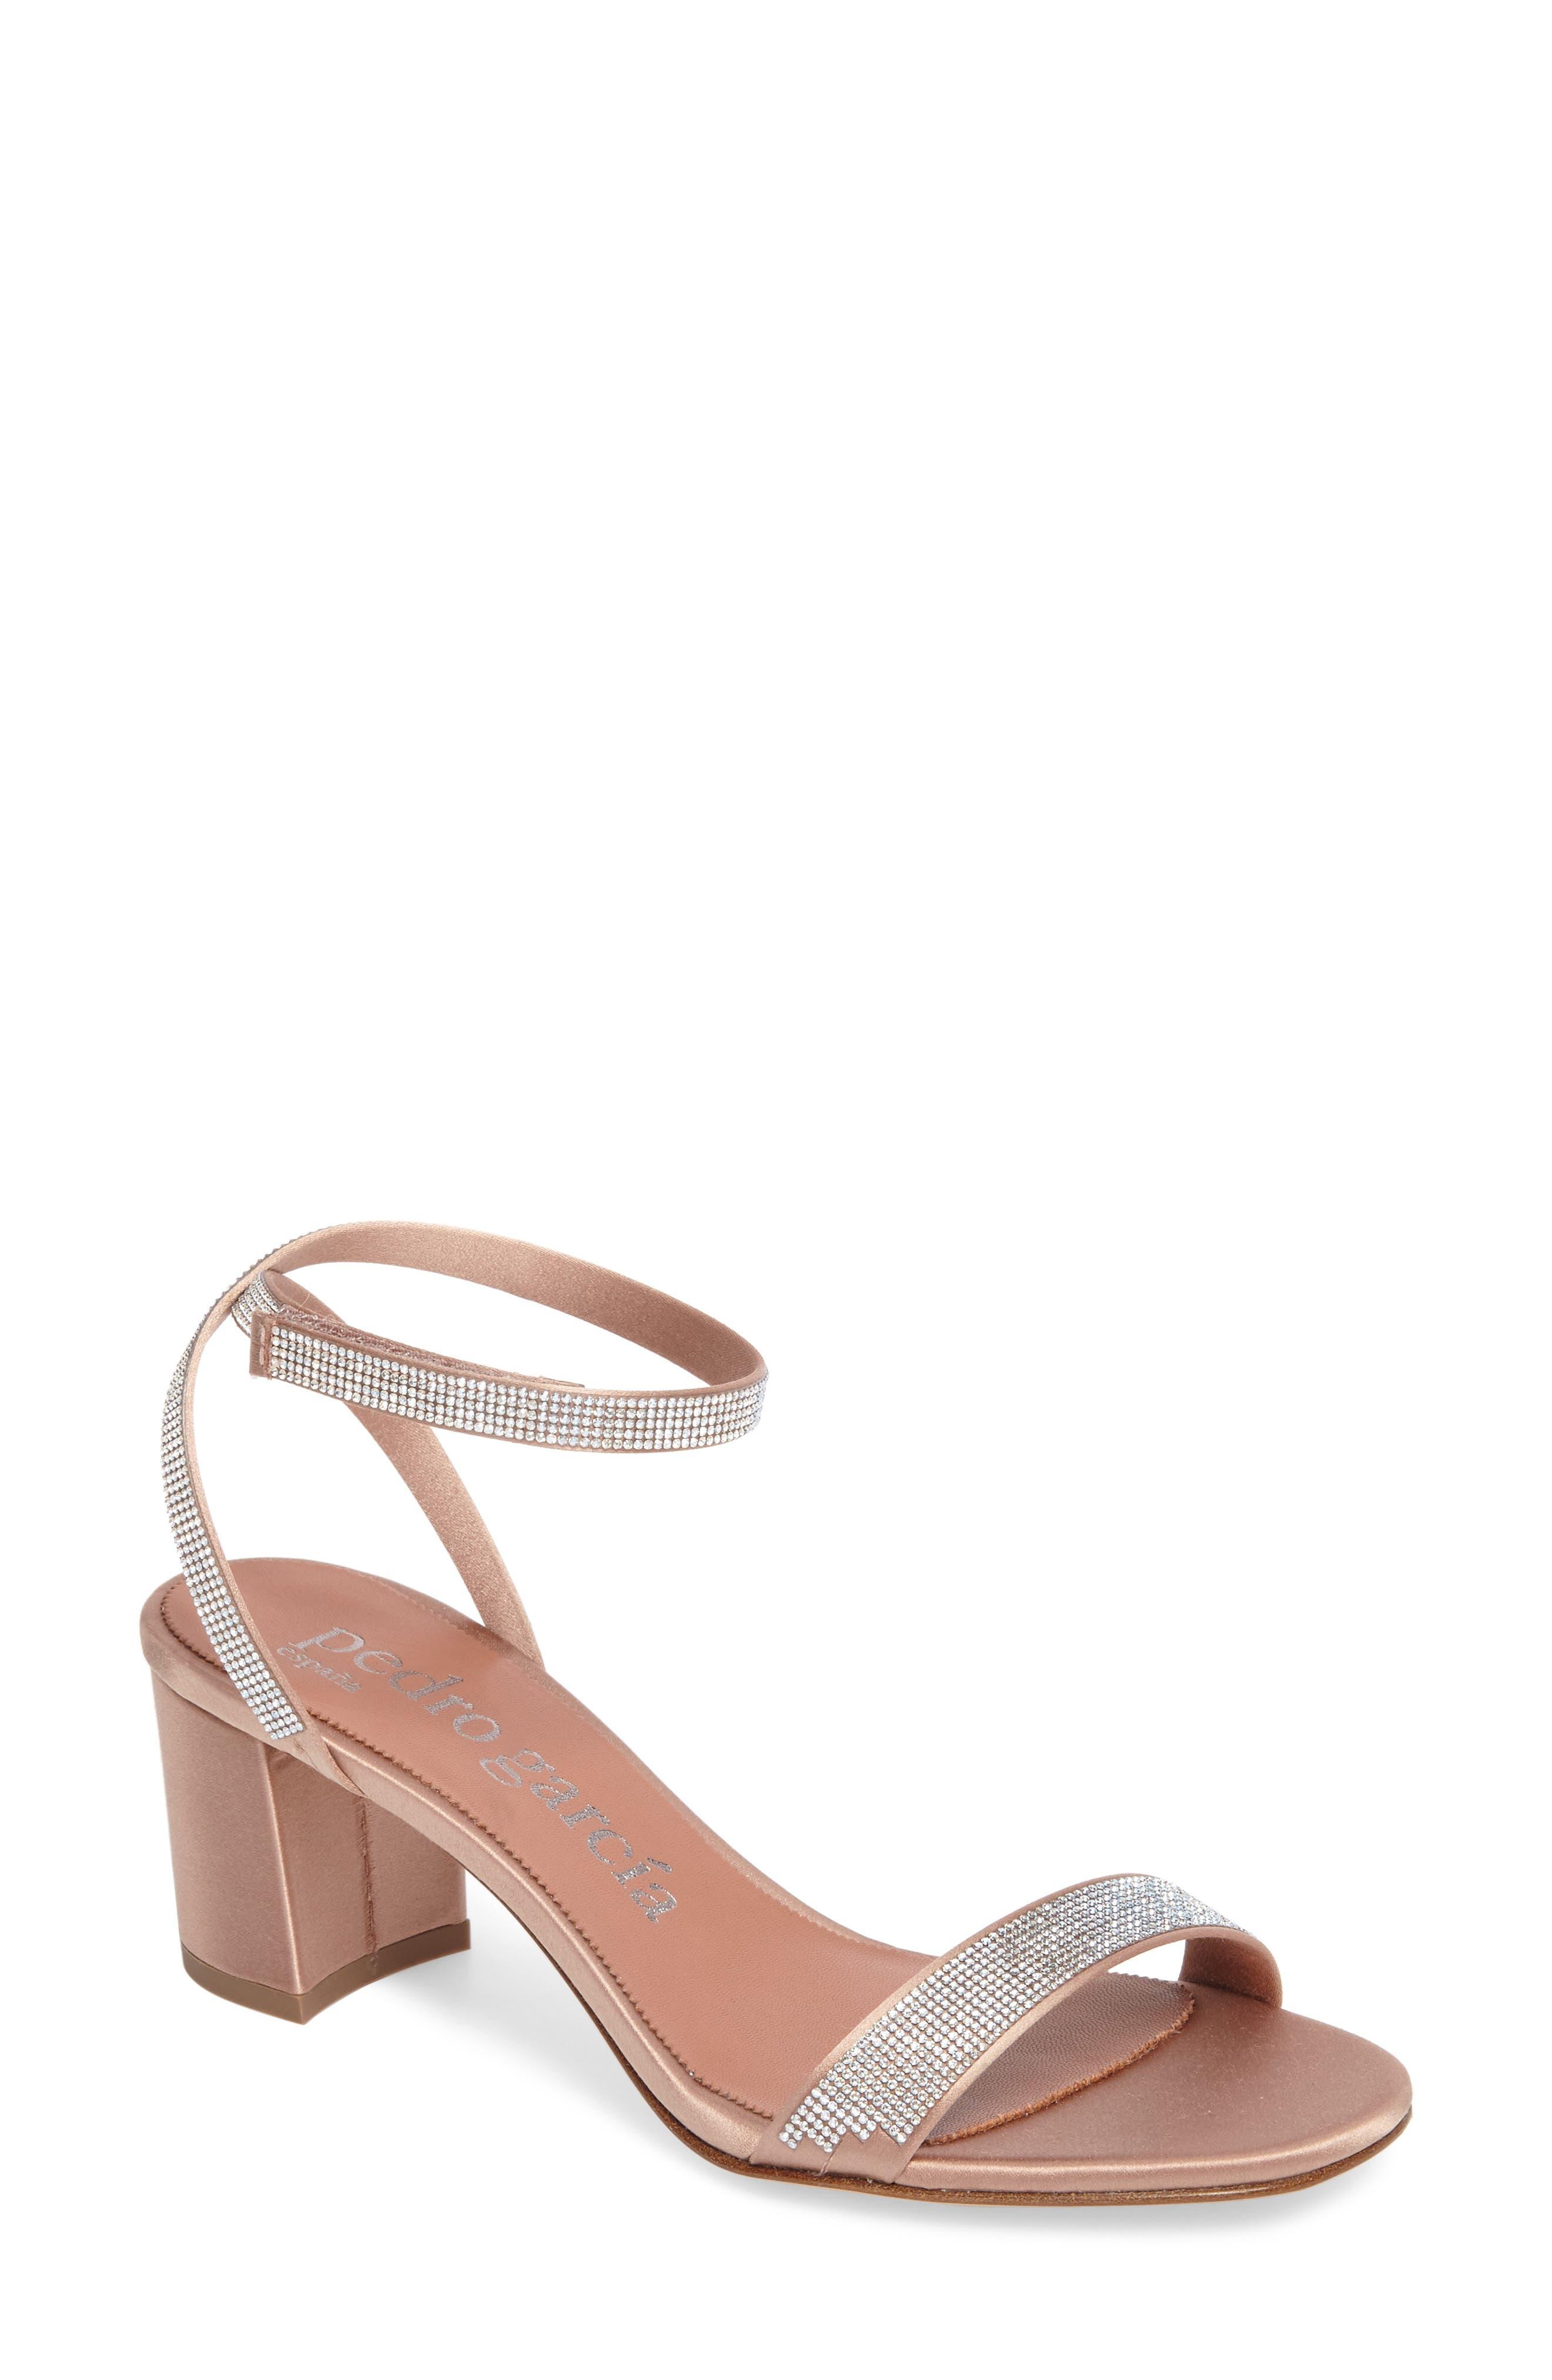 Alternate Image 1 Selected - Pedro Garcia Xela Block Heel Sandal (Women)